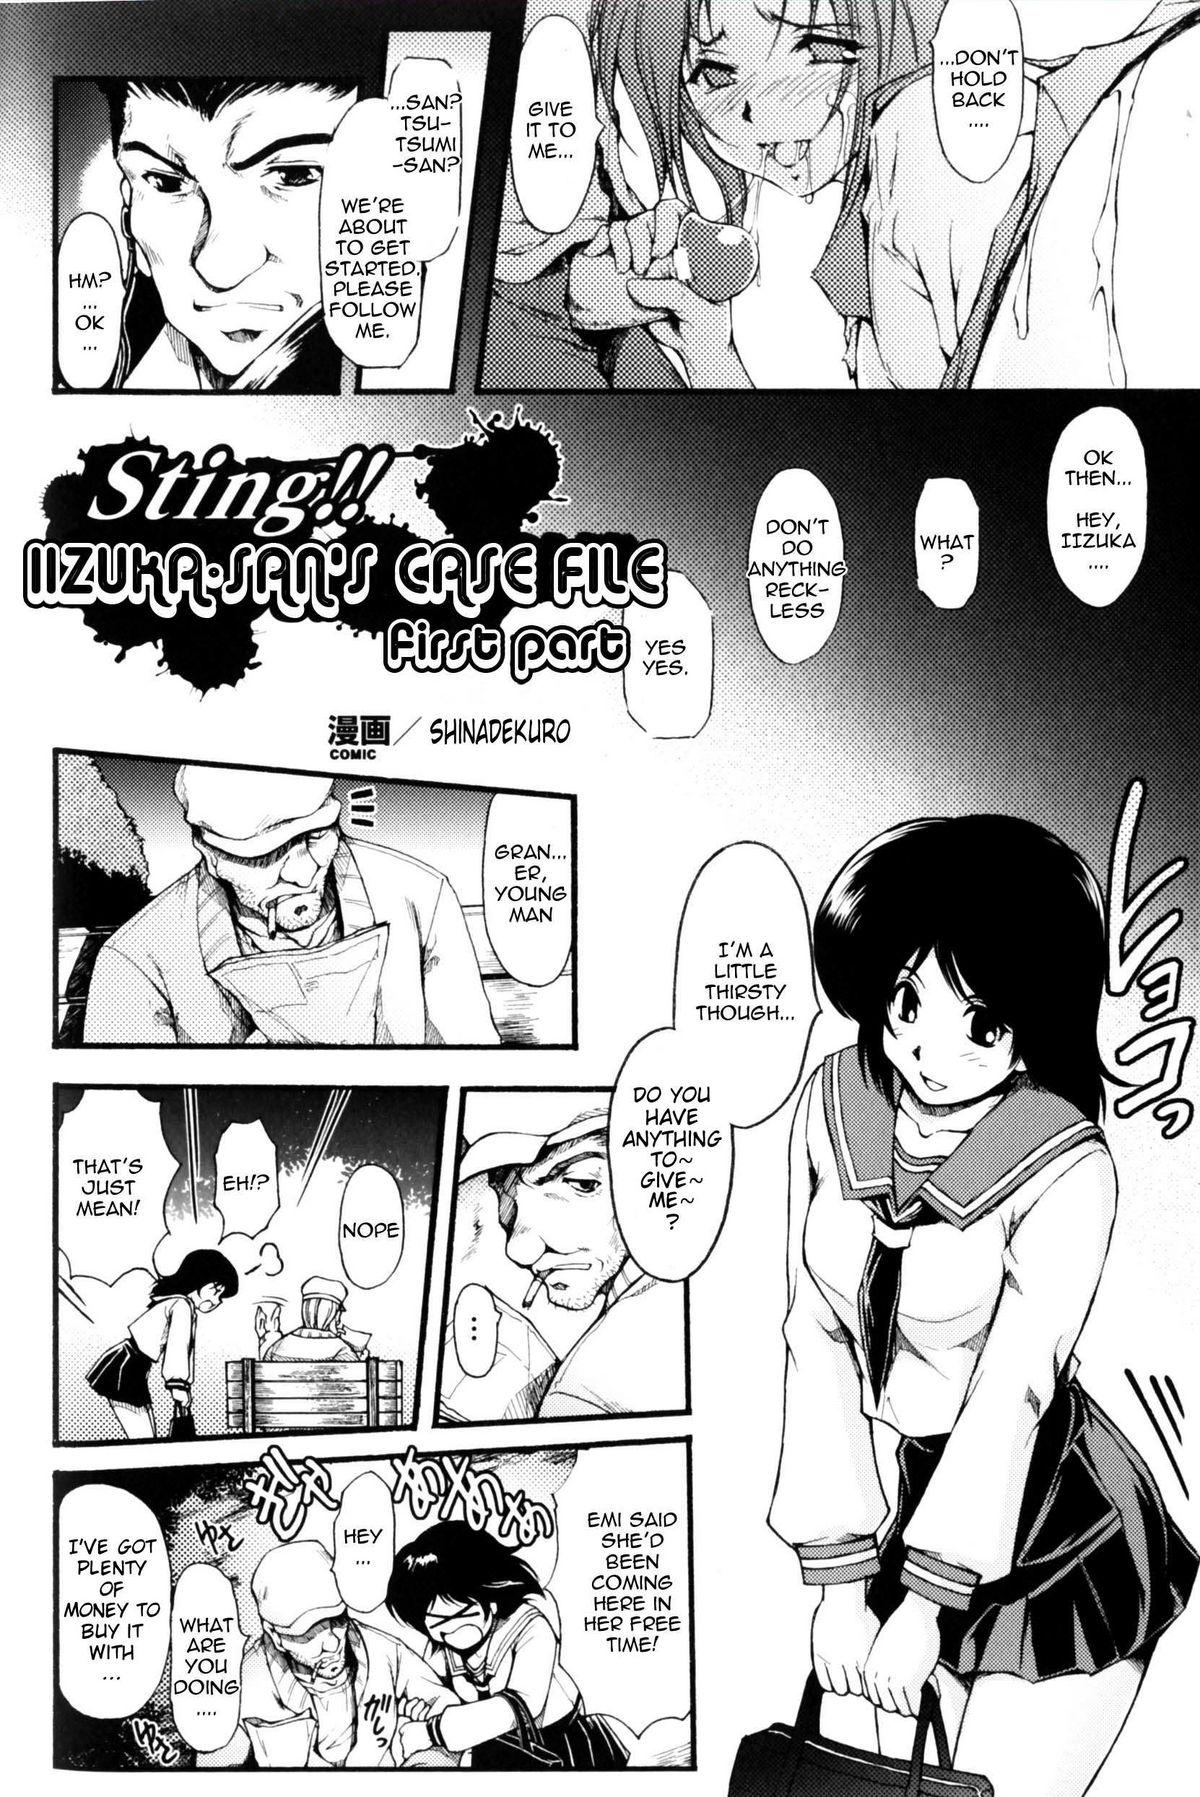 Itzuka-san's Case File 1